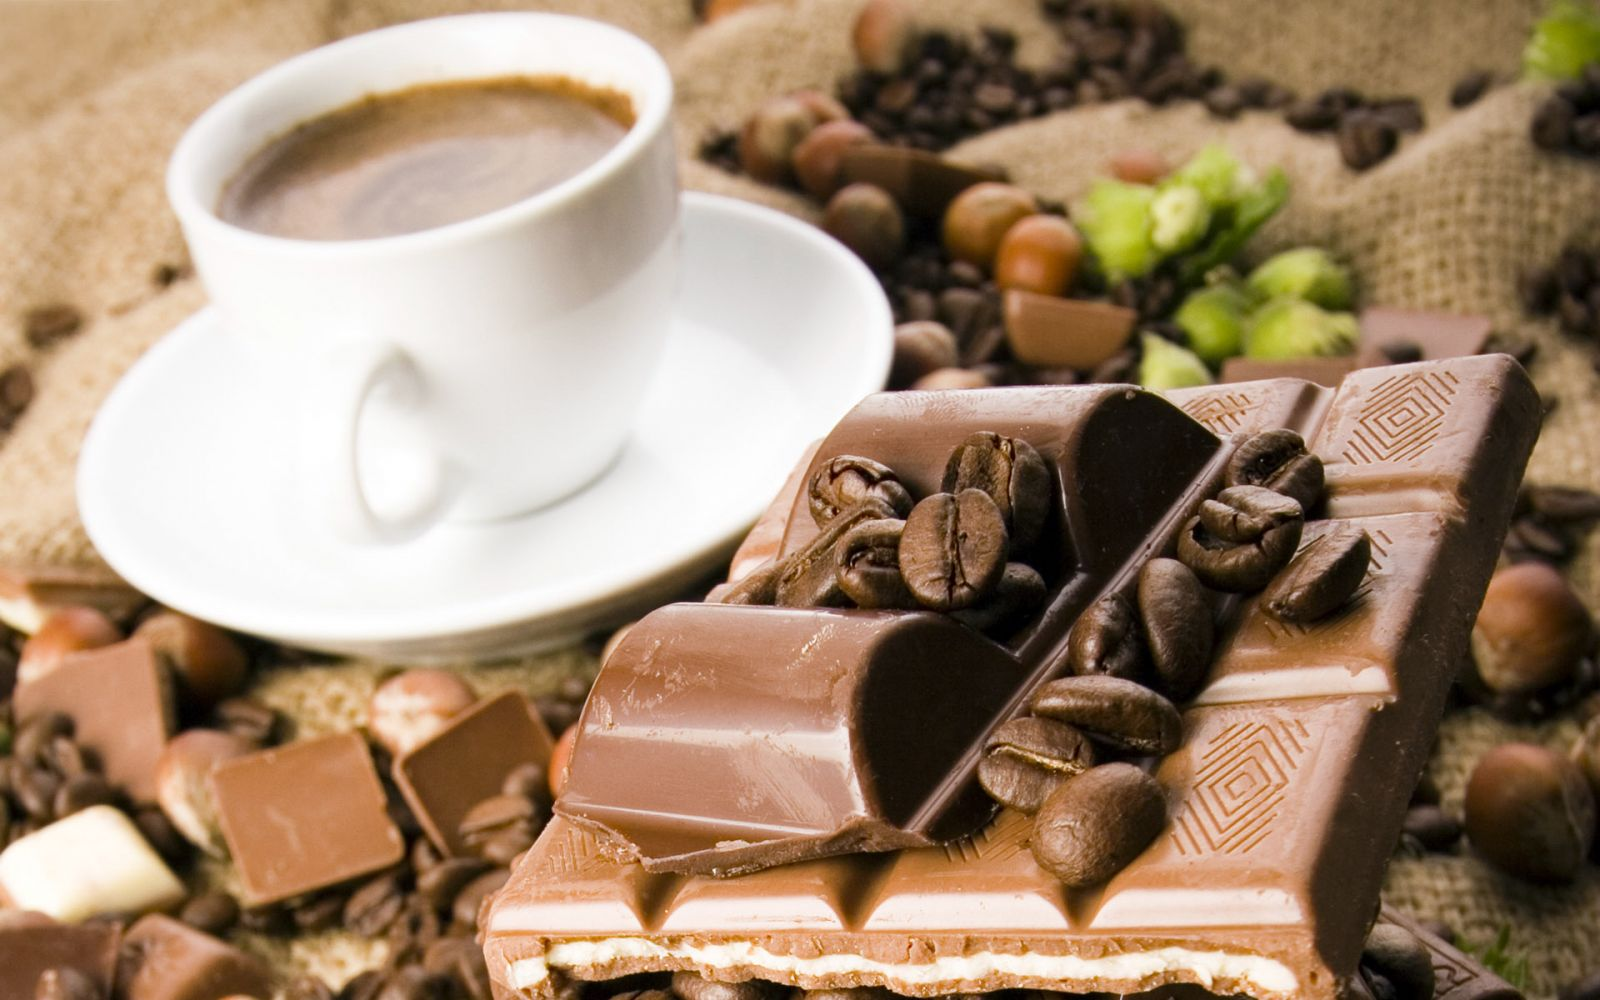 Кофе и шоколад при диете